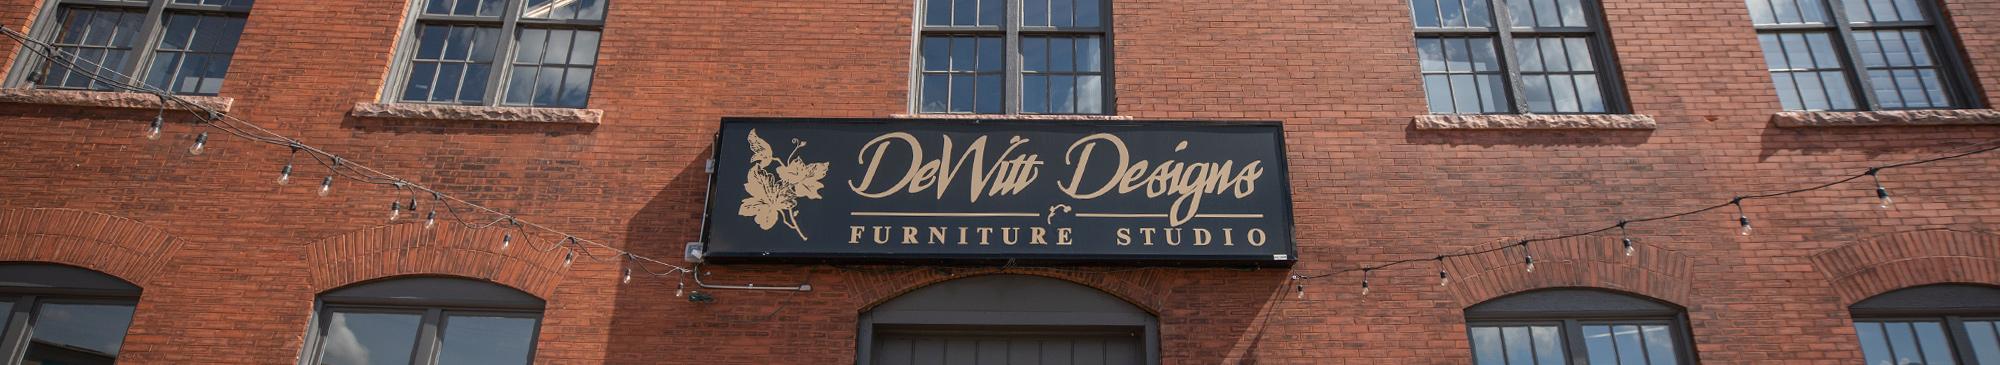 The brick exterior of DeWitt showroom with black sign that reads DeWitt Designs